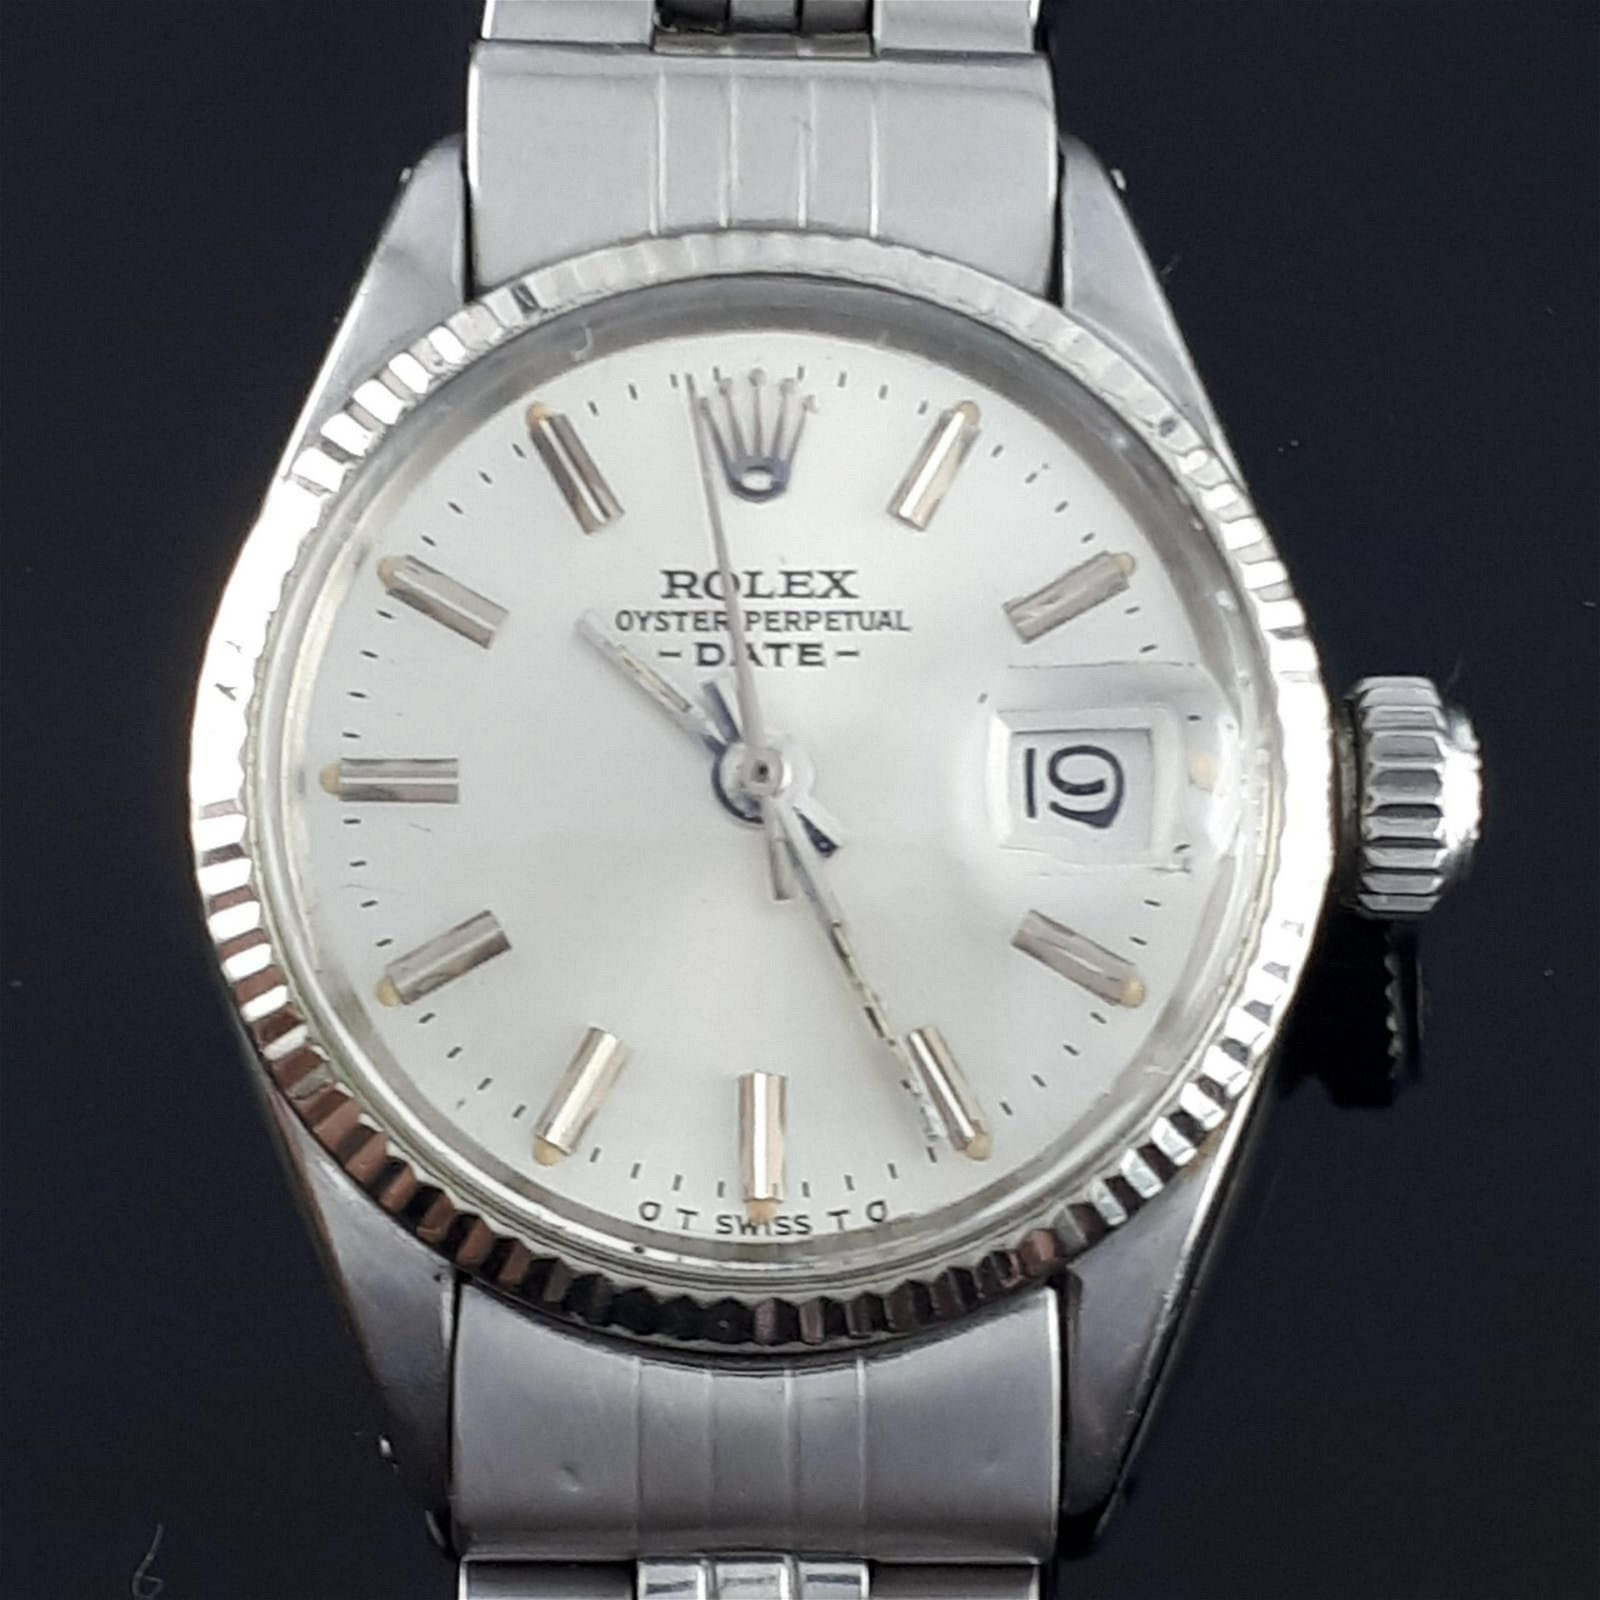 Rolex - Oyster Perpetual Date - 6517 - Women -